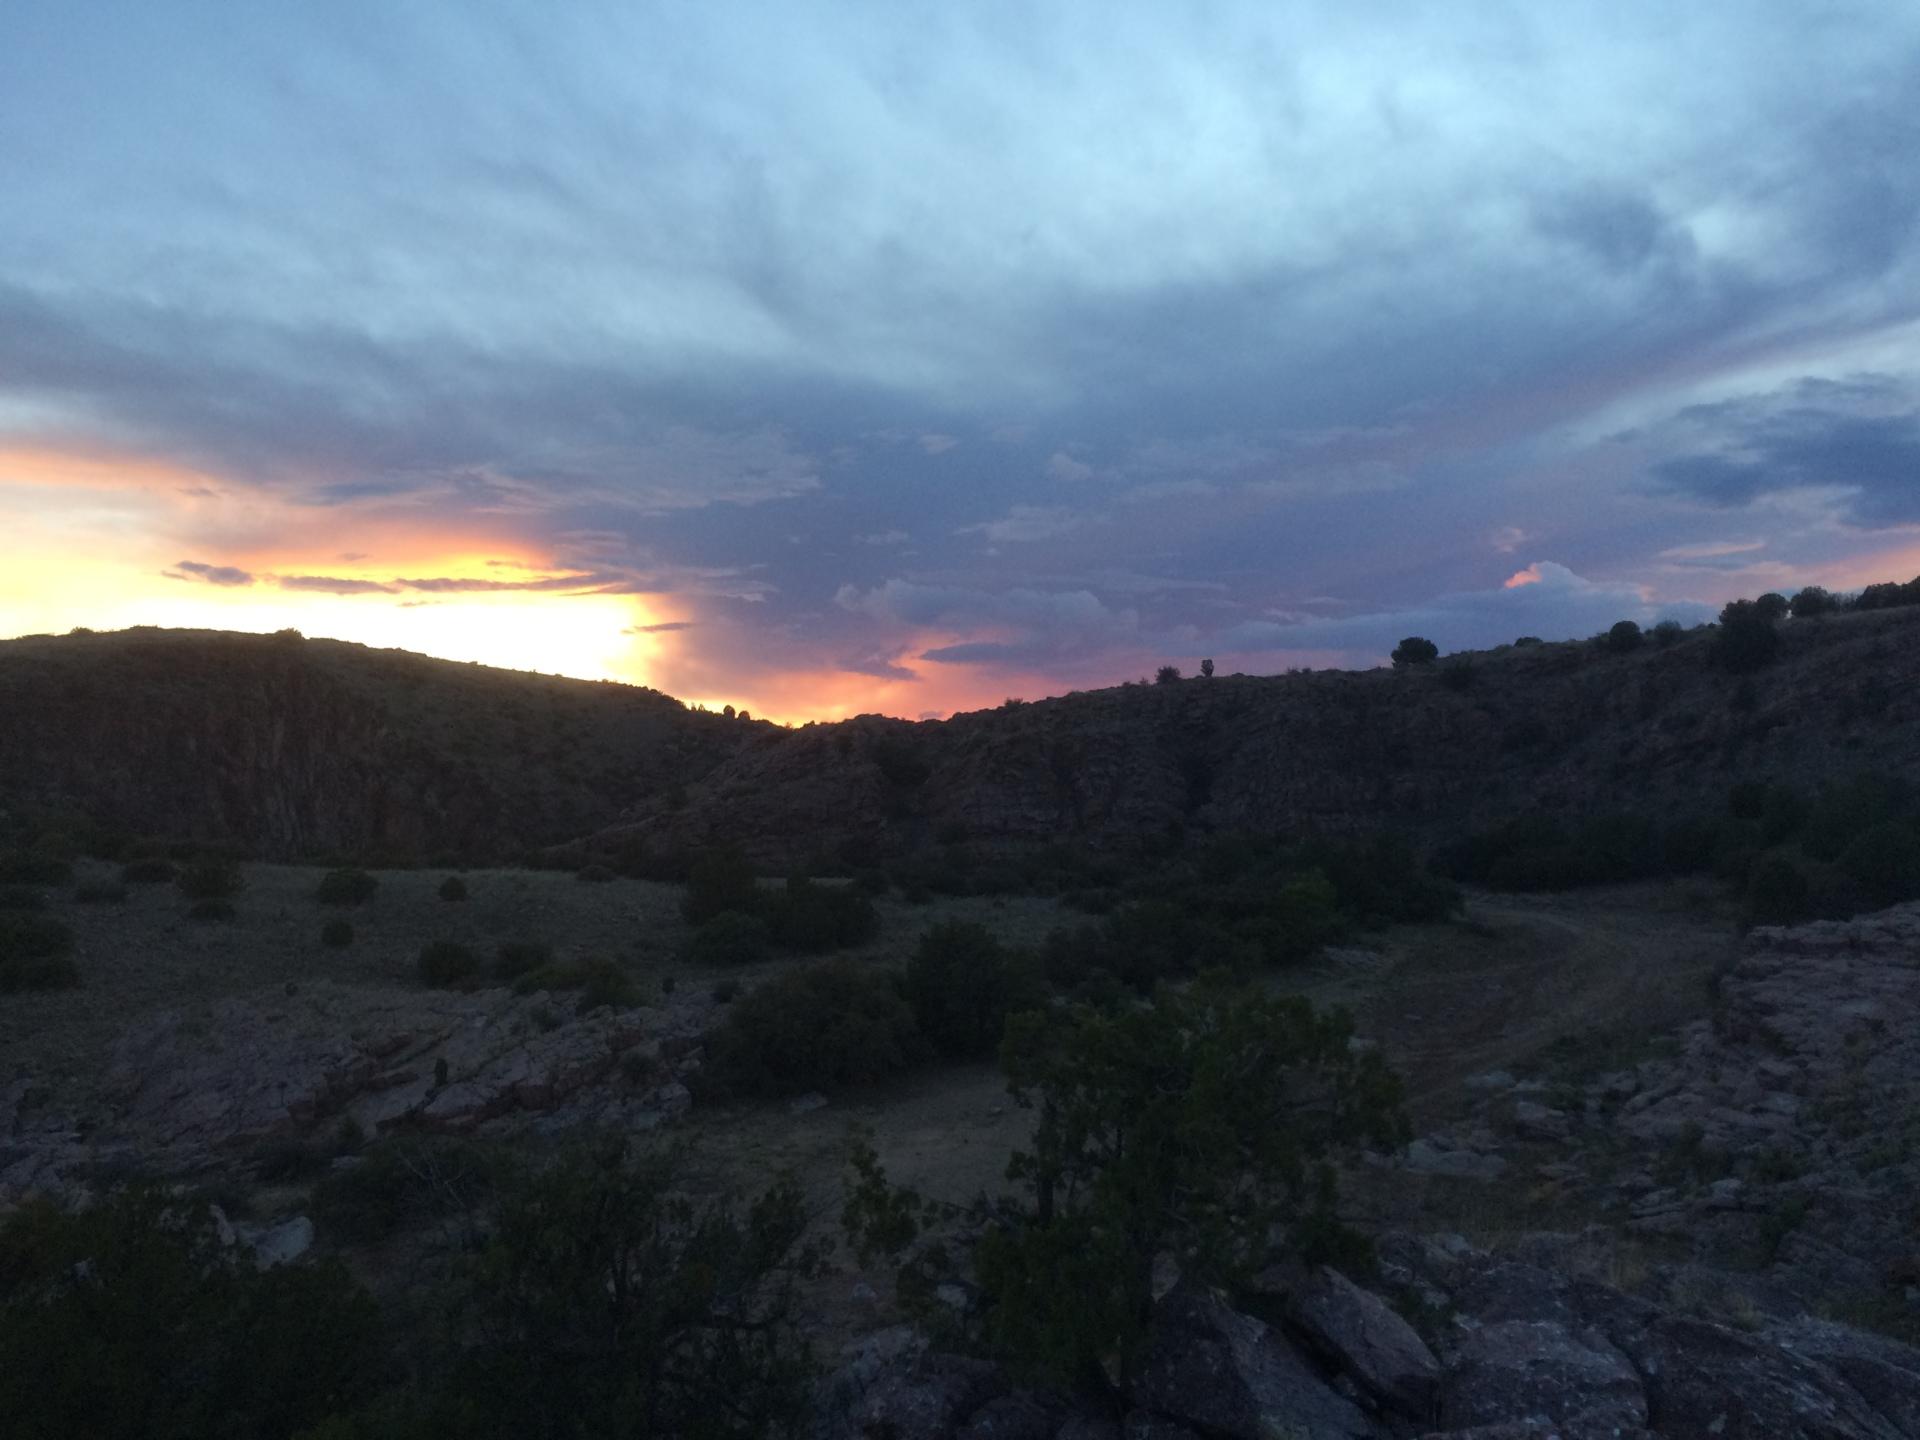 Sunset at Granite Creek, Arizona Backpacking